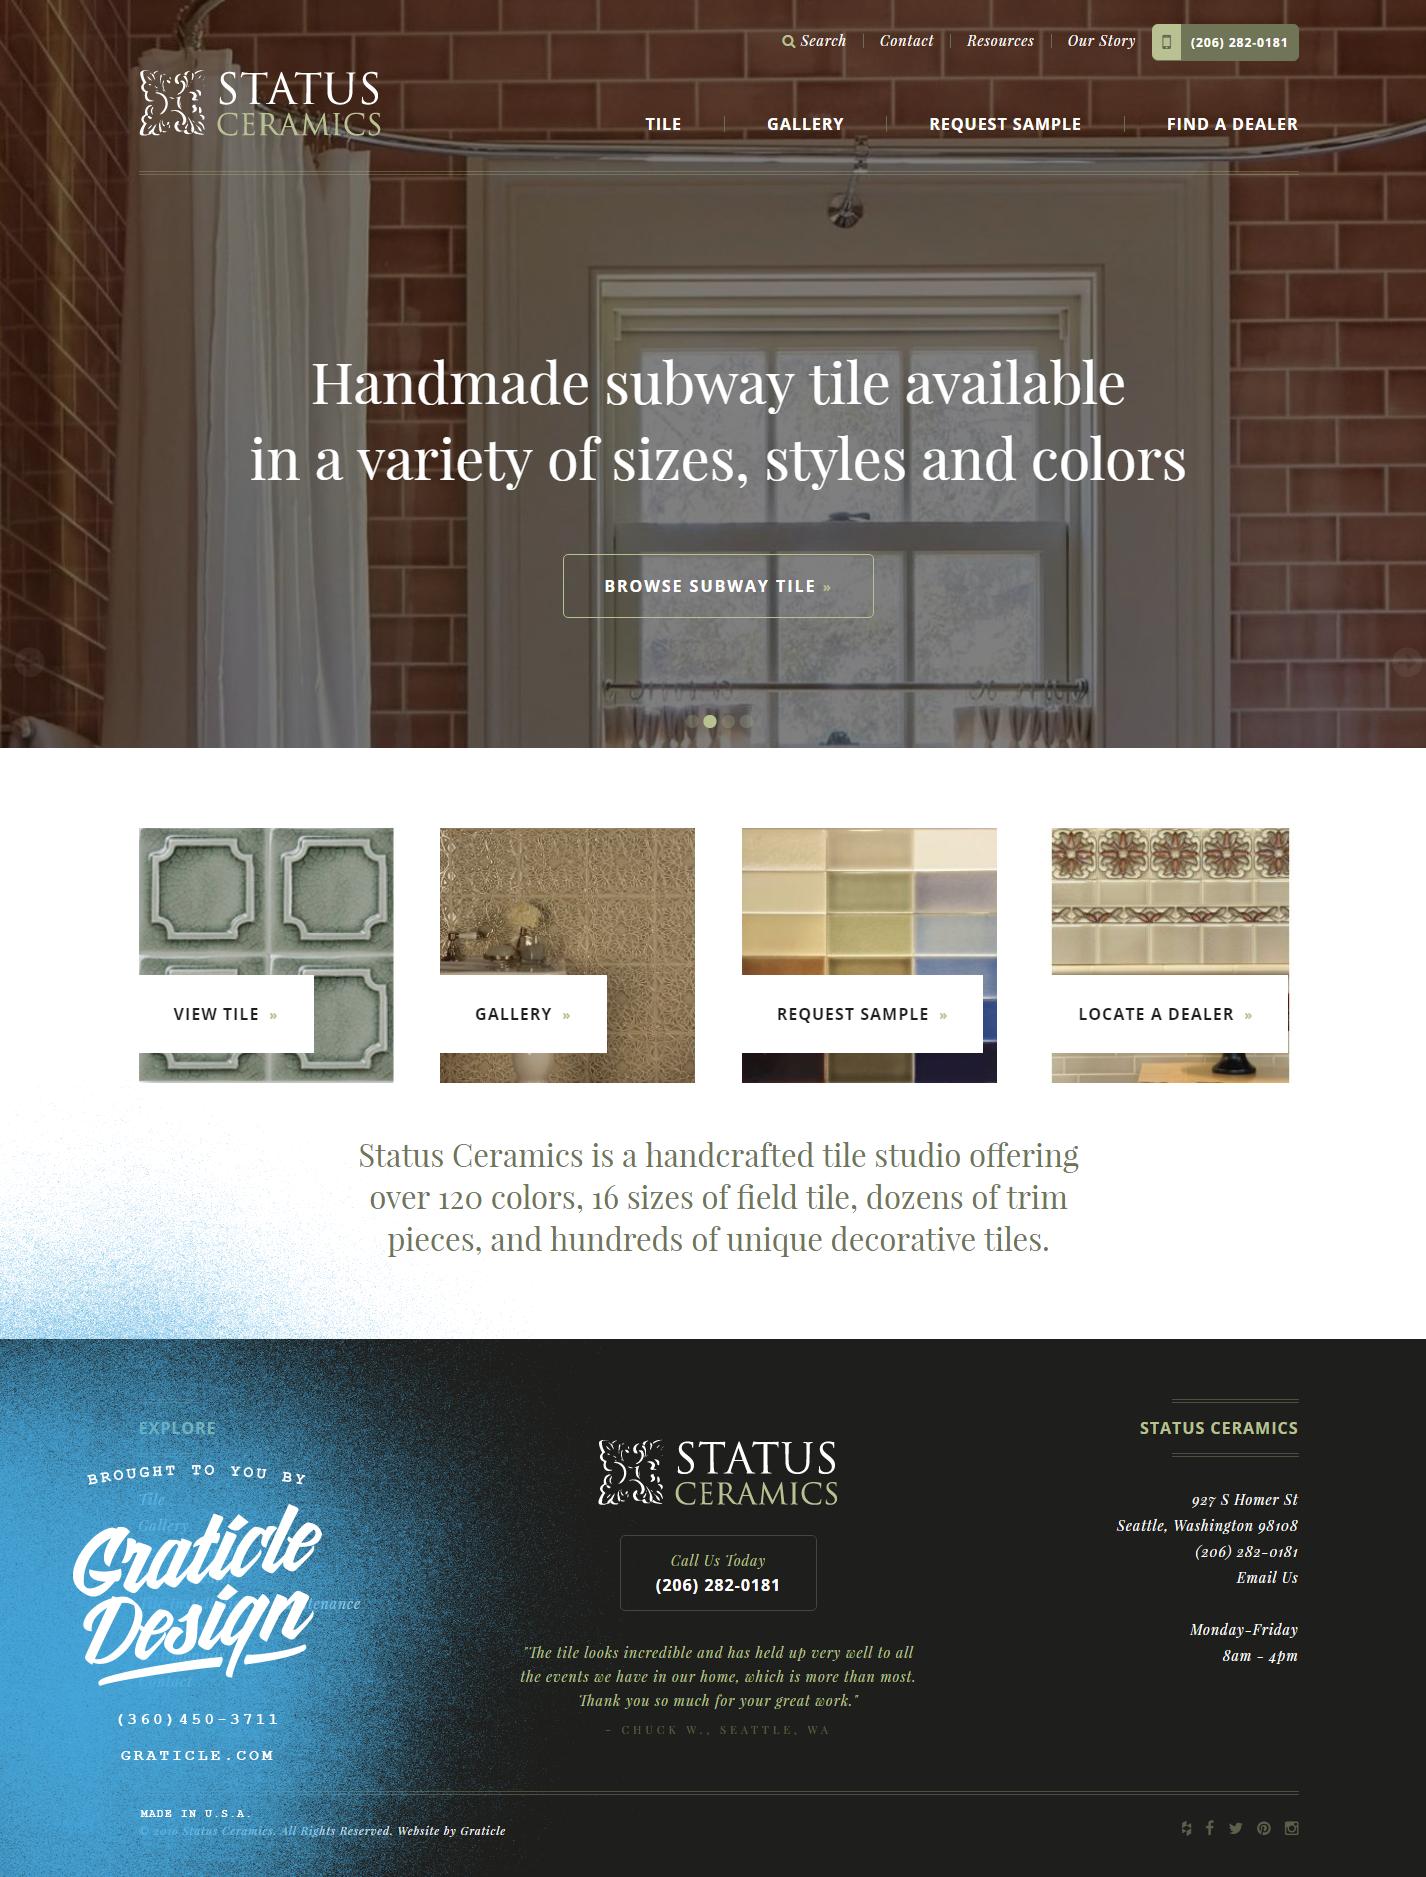 Status Ceramics Graticle Design Longview Washington Design Handmade Subway Tile Handcrafted Tile